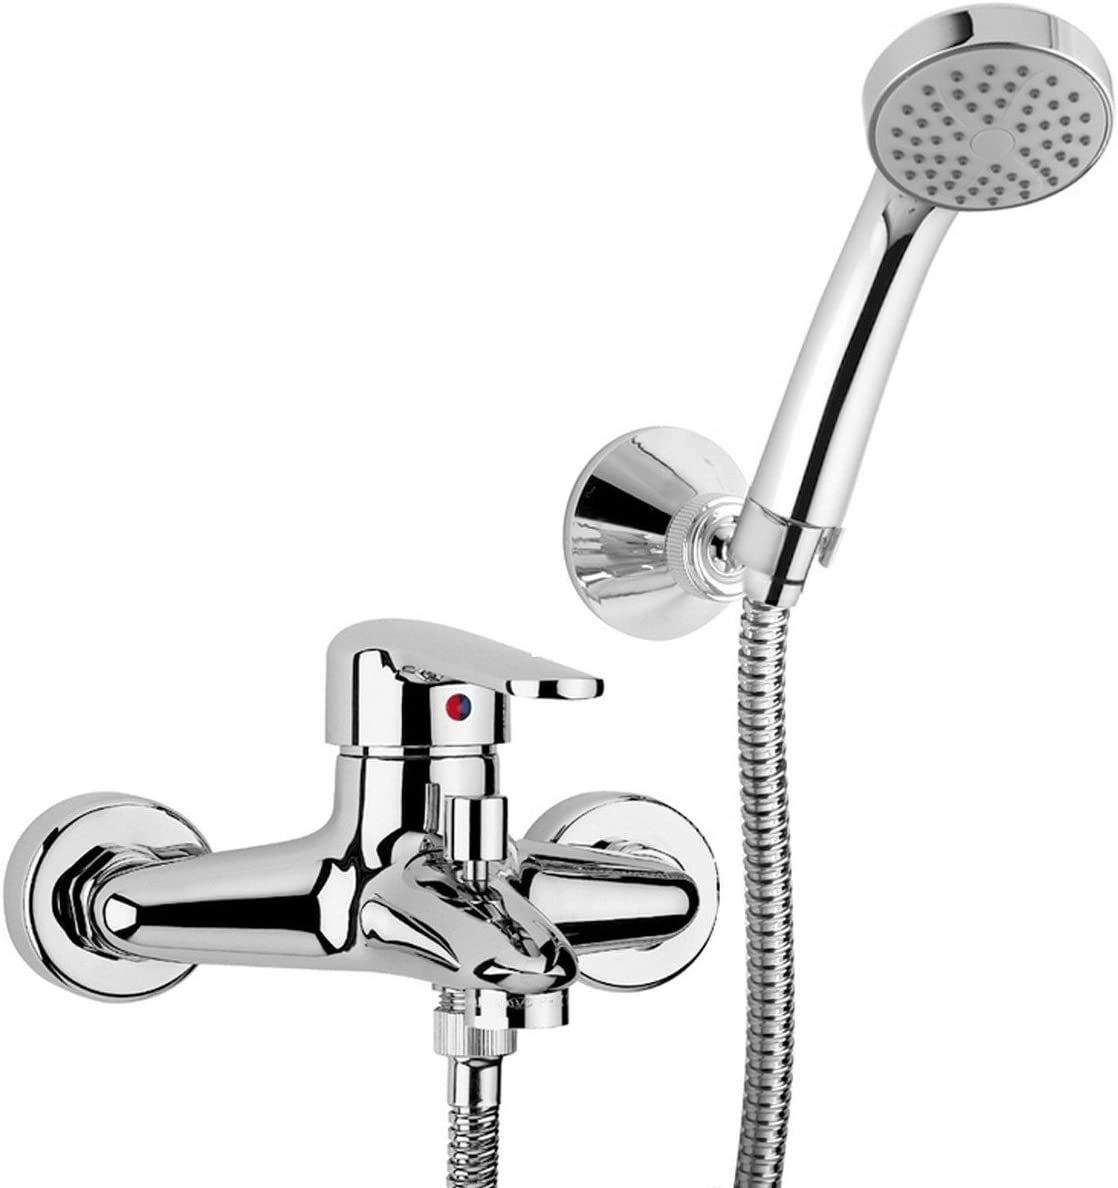 PAINI COOPER 80CR105 Miscelatore vasca esterno con doccia